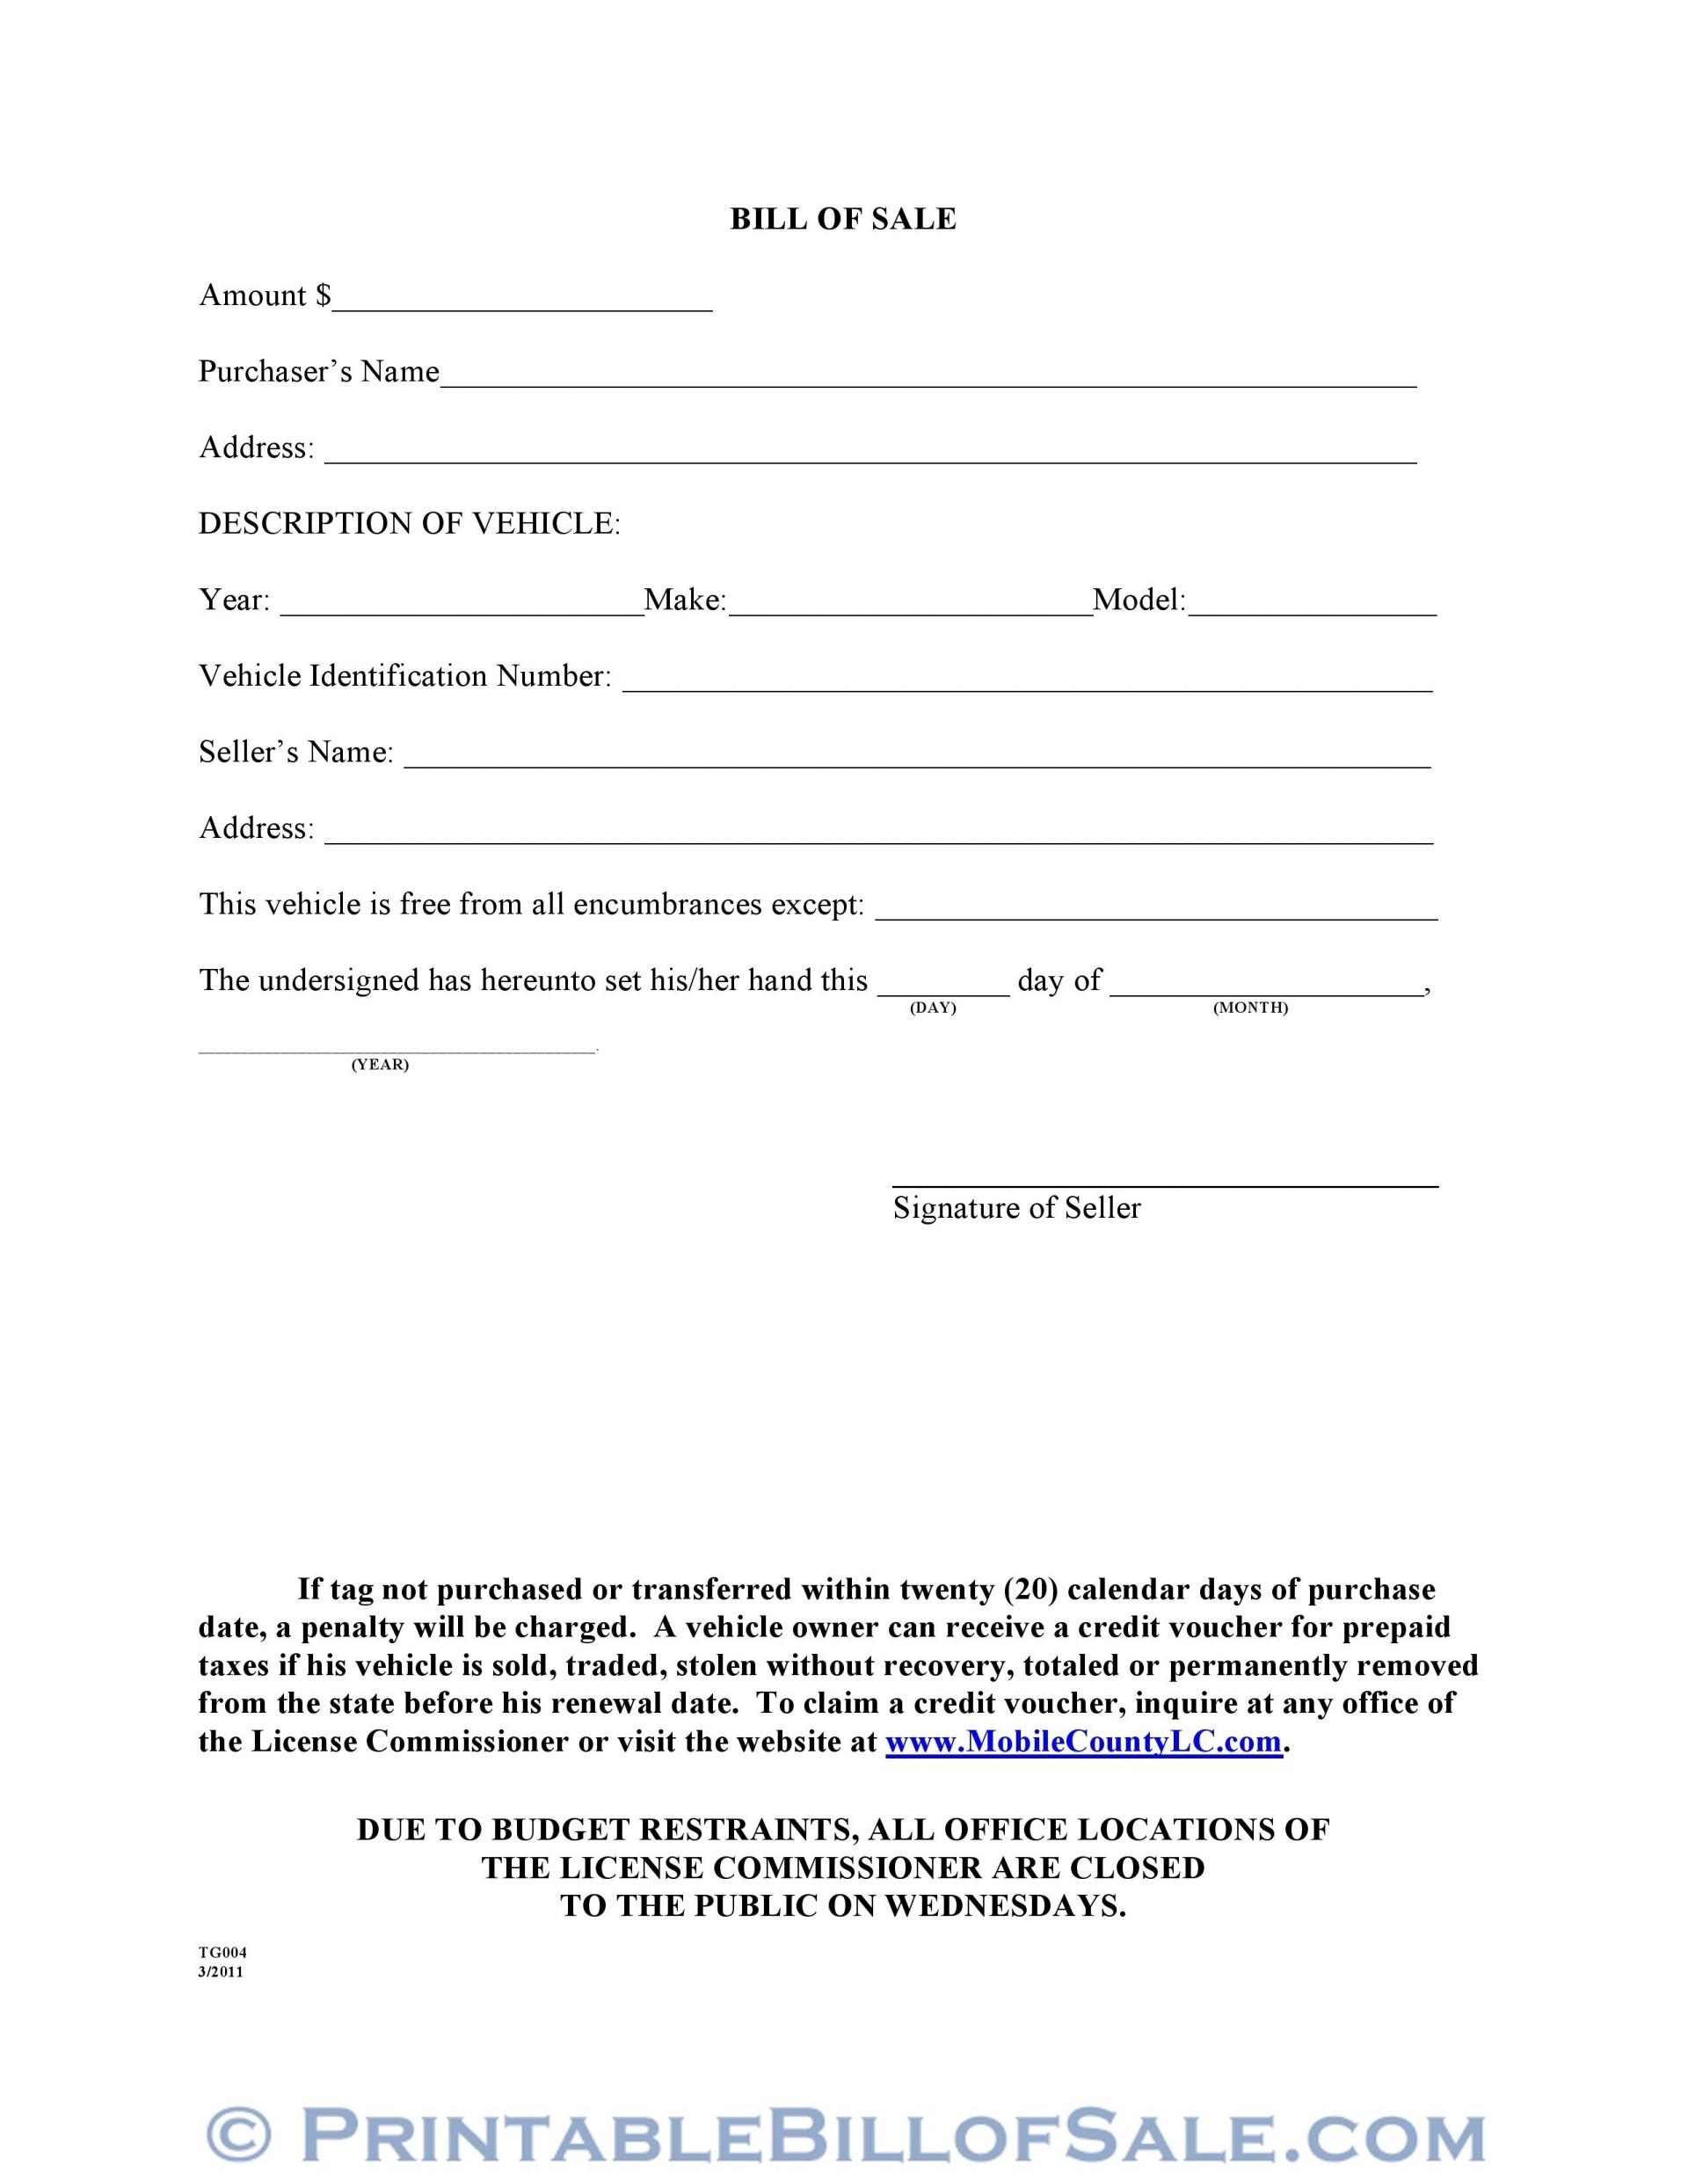 006 Magnificent Printable Bill Of Sale Template Inspiration  Word Saskatchewan Free Used Car Ontario1920